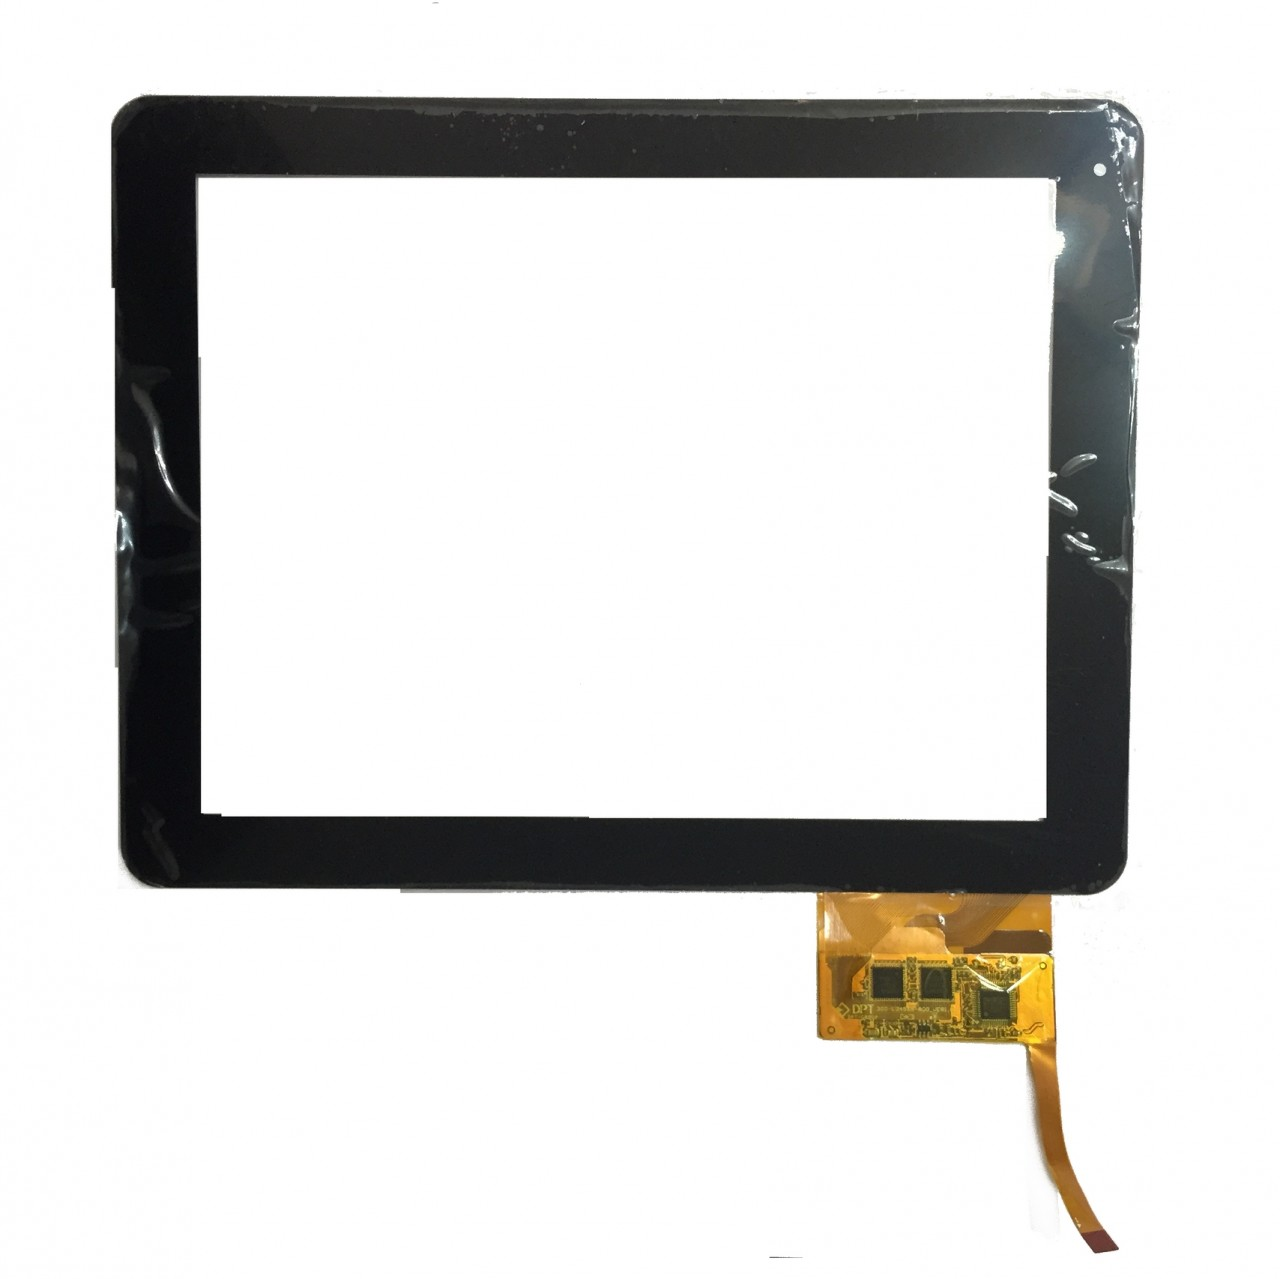 Touchscreen Digitizer Allview Alldro 3 Geam Sticla Tableta imagine powerlaptop.ro 2021